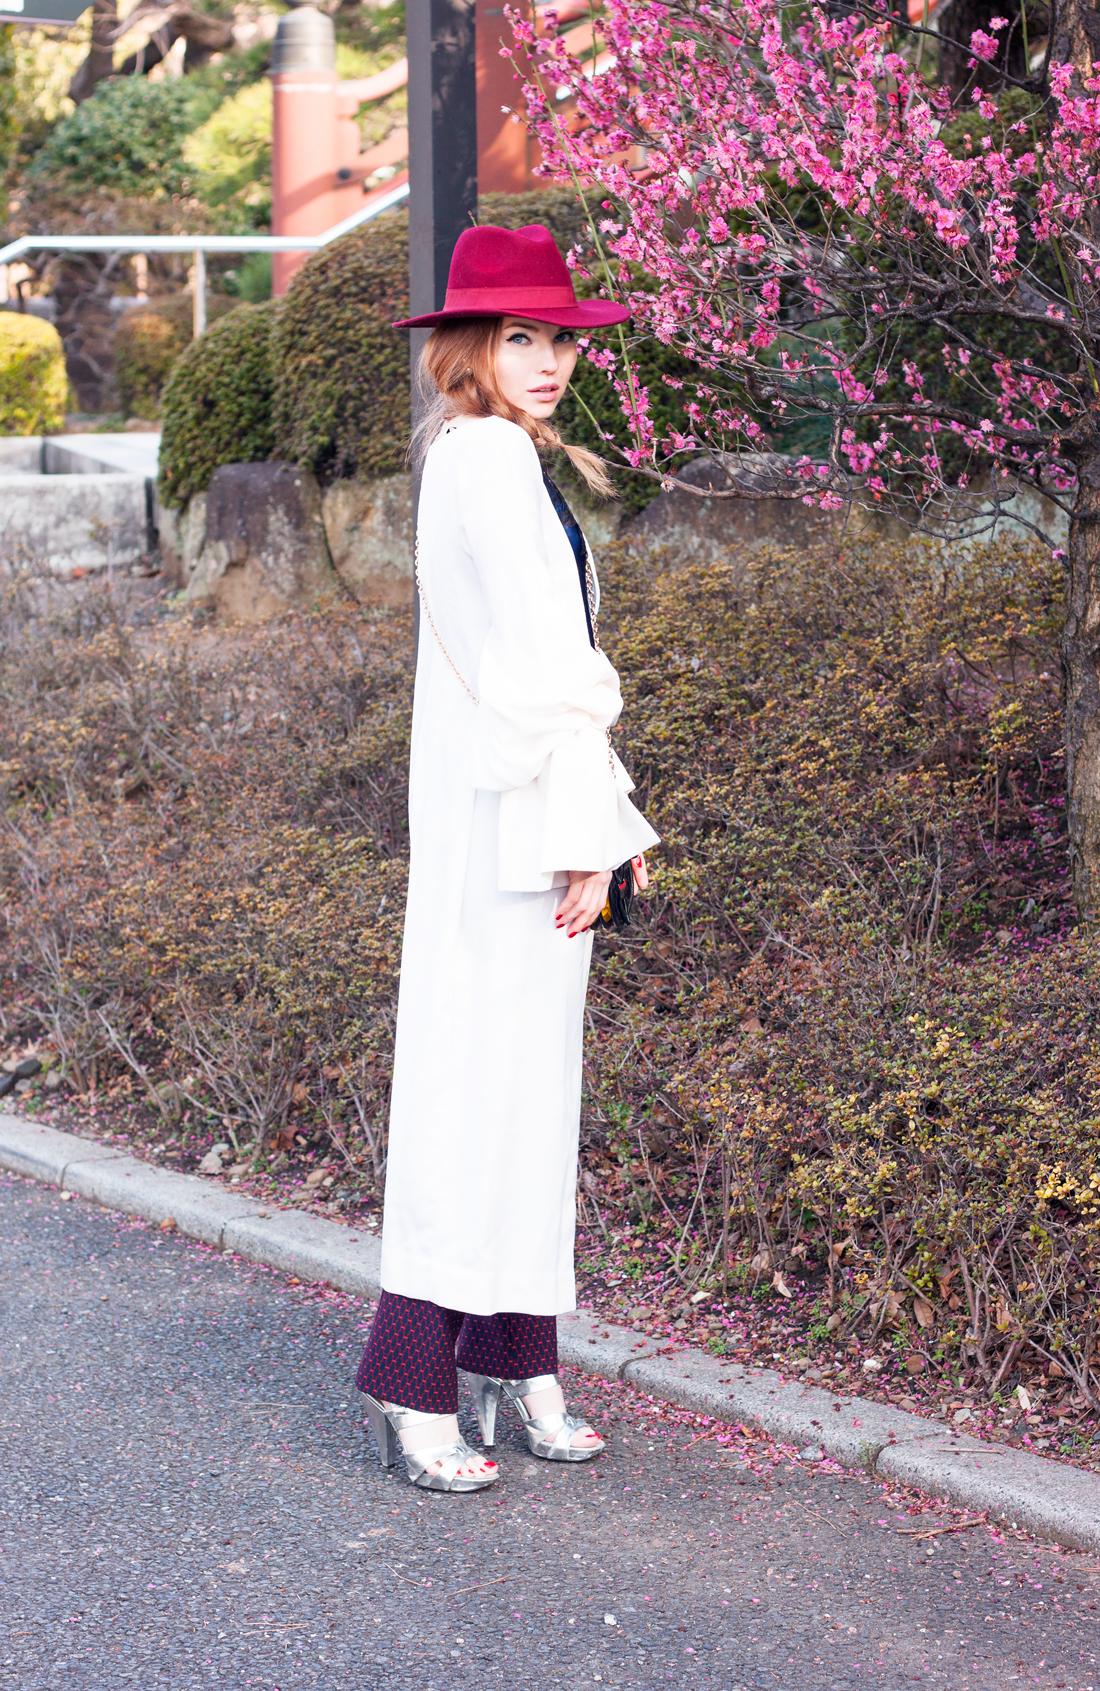 Calle Evans, American Fashion Designer, wool coat, fedora, japan, temple japanese, japanese culture, japanese history, tokyo, tokyo street style, ume blossom, zojo-ji temple